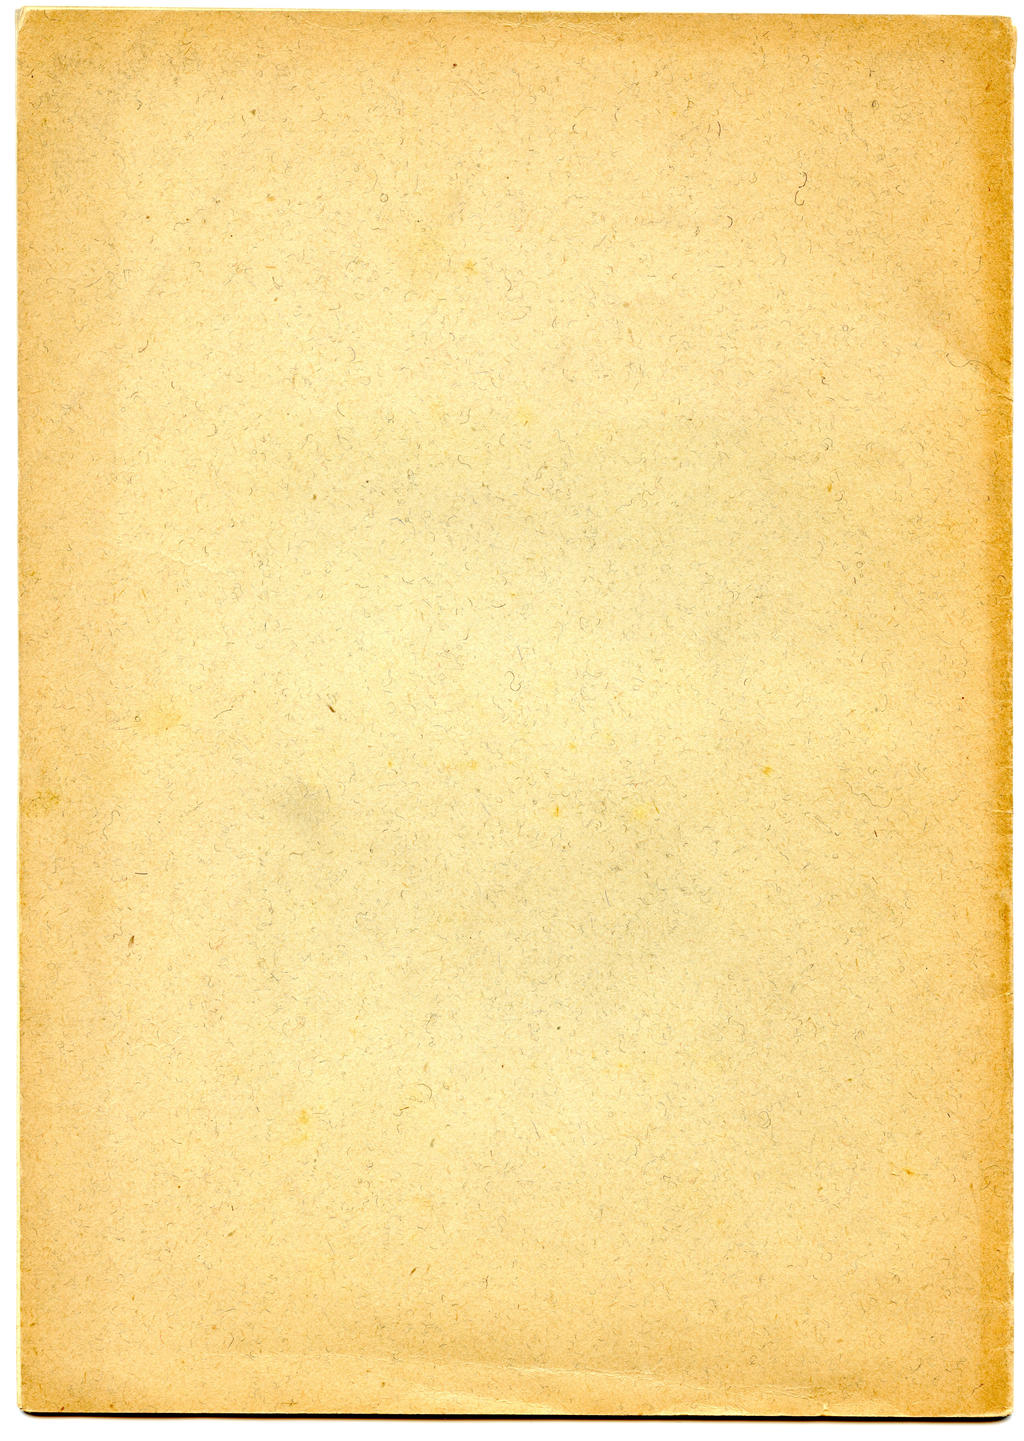 Paper texture 041 by LisaGorska